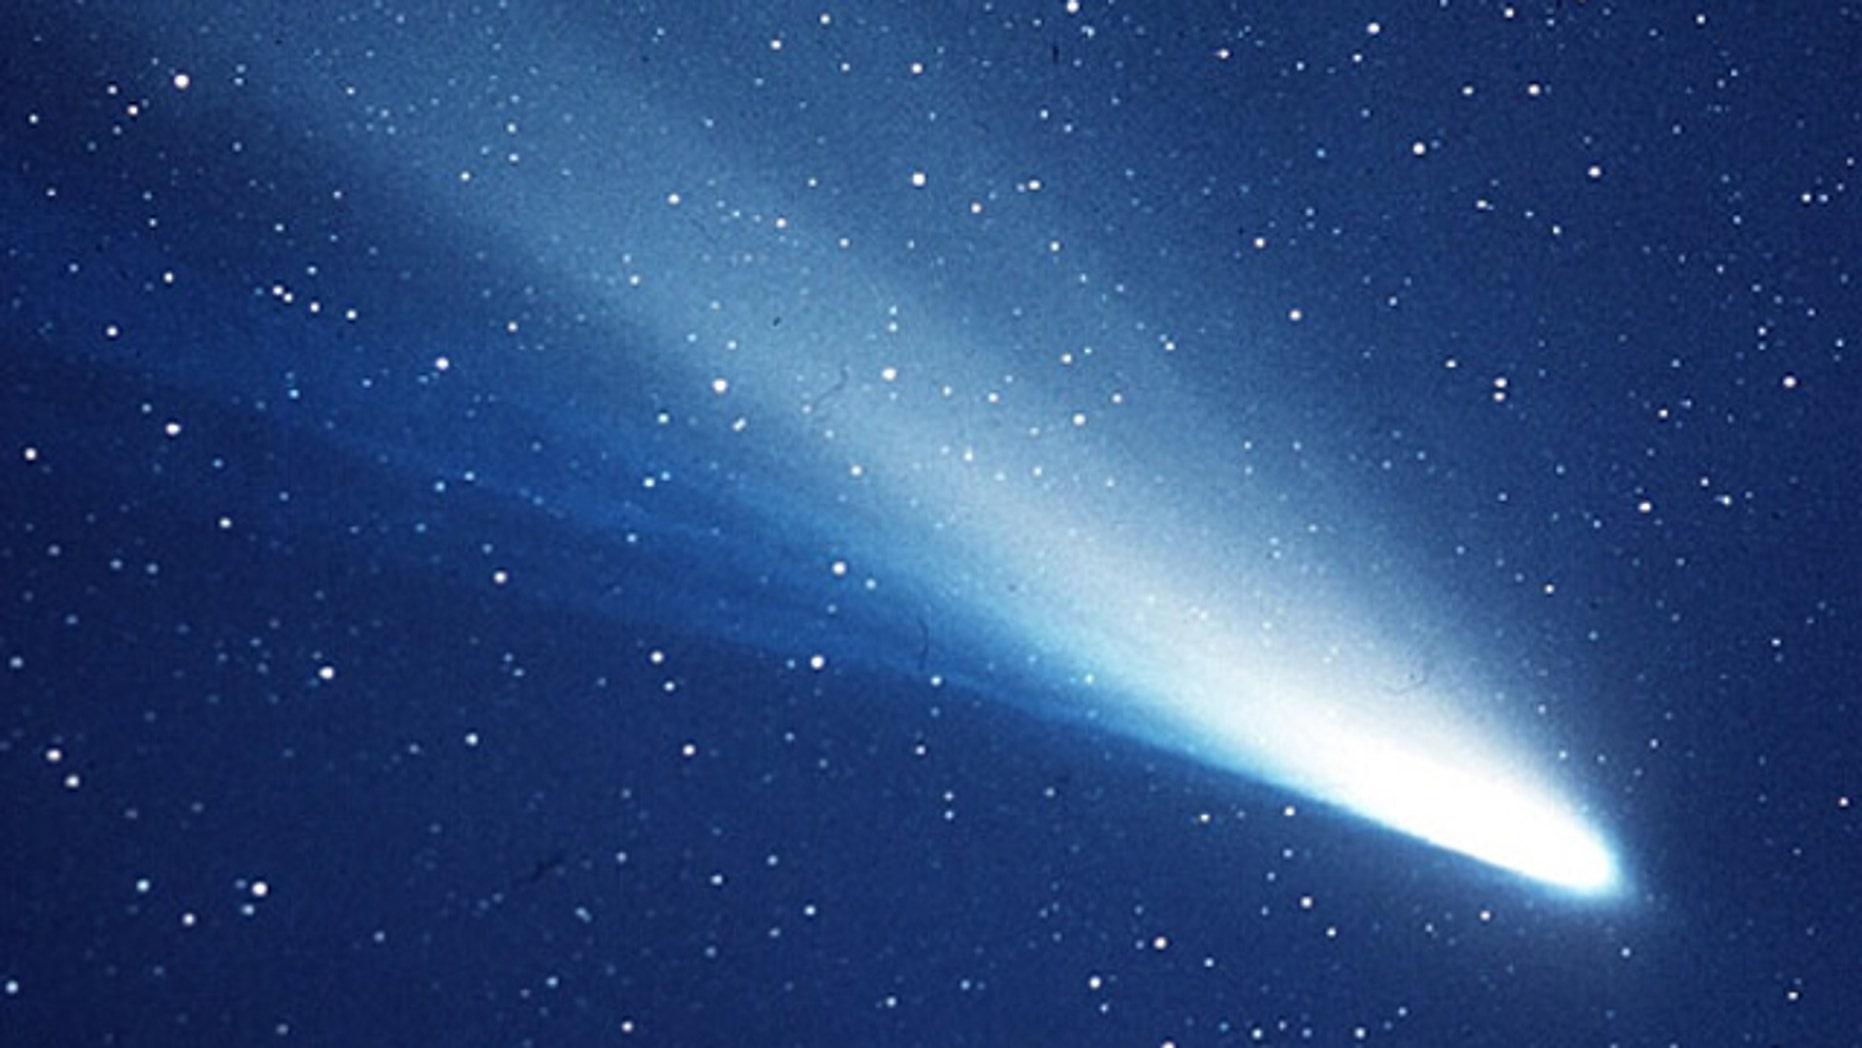 An image of Halley's Comet taken in 1986.